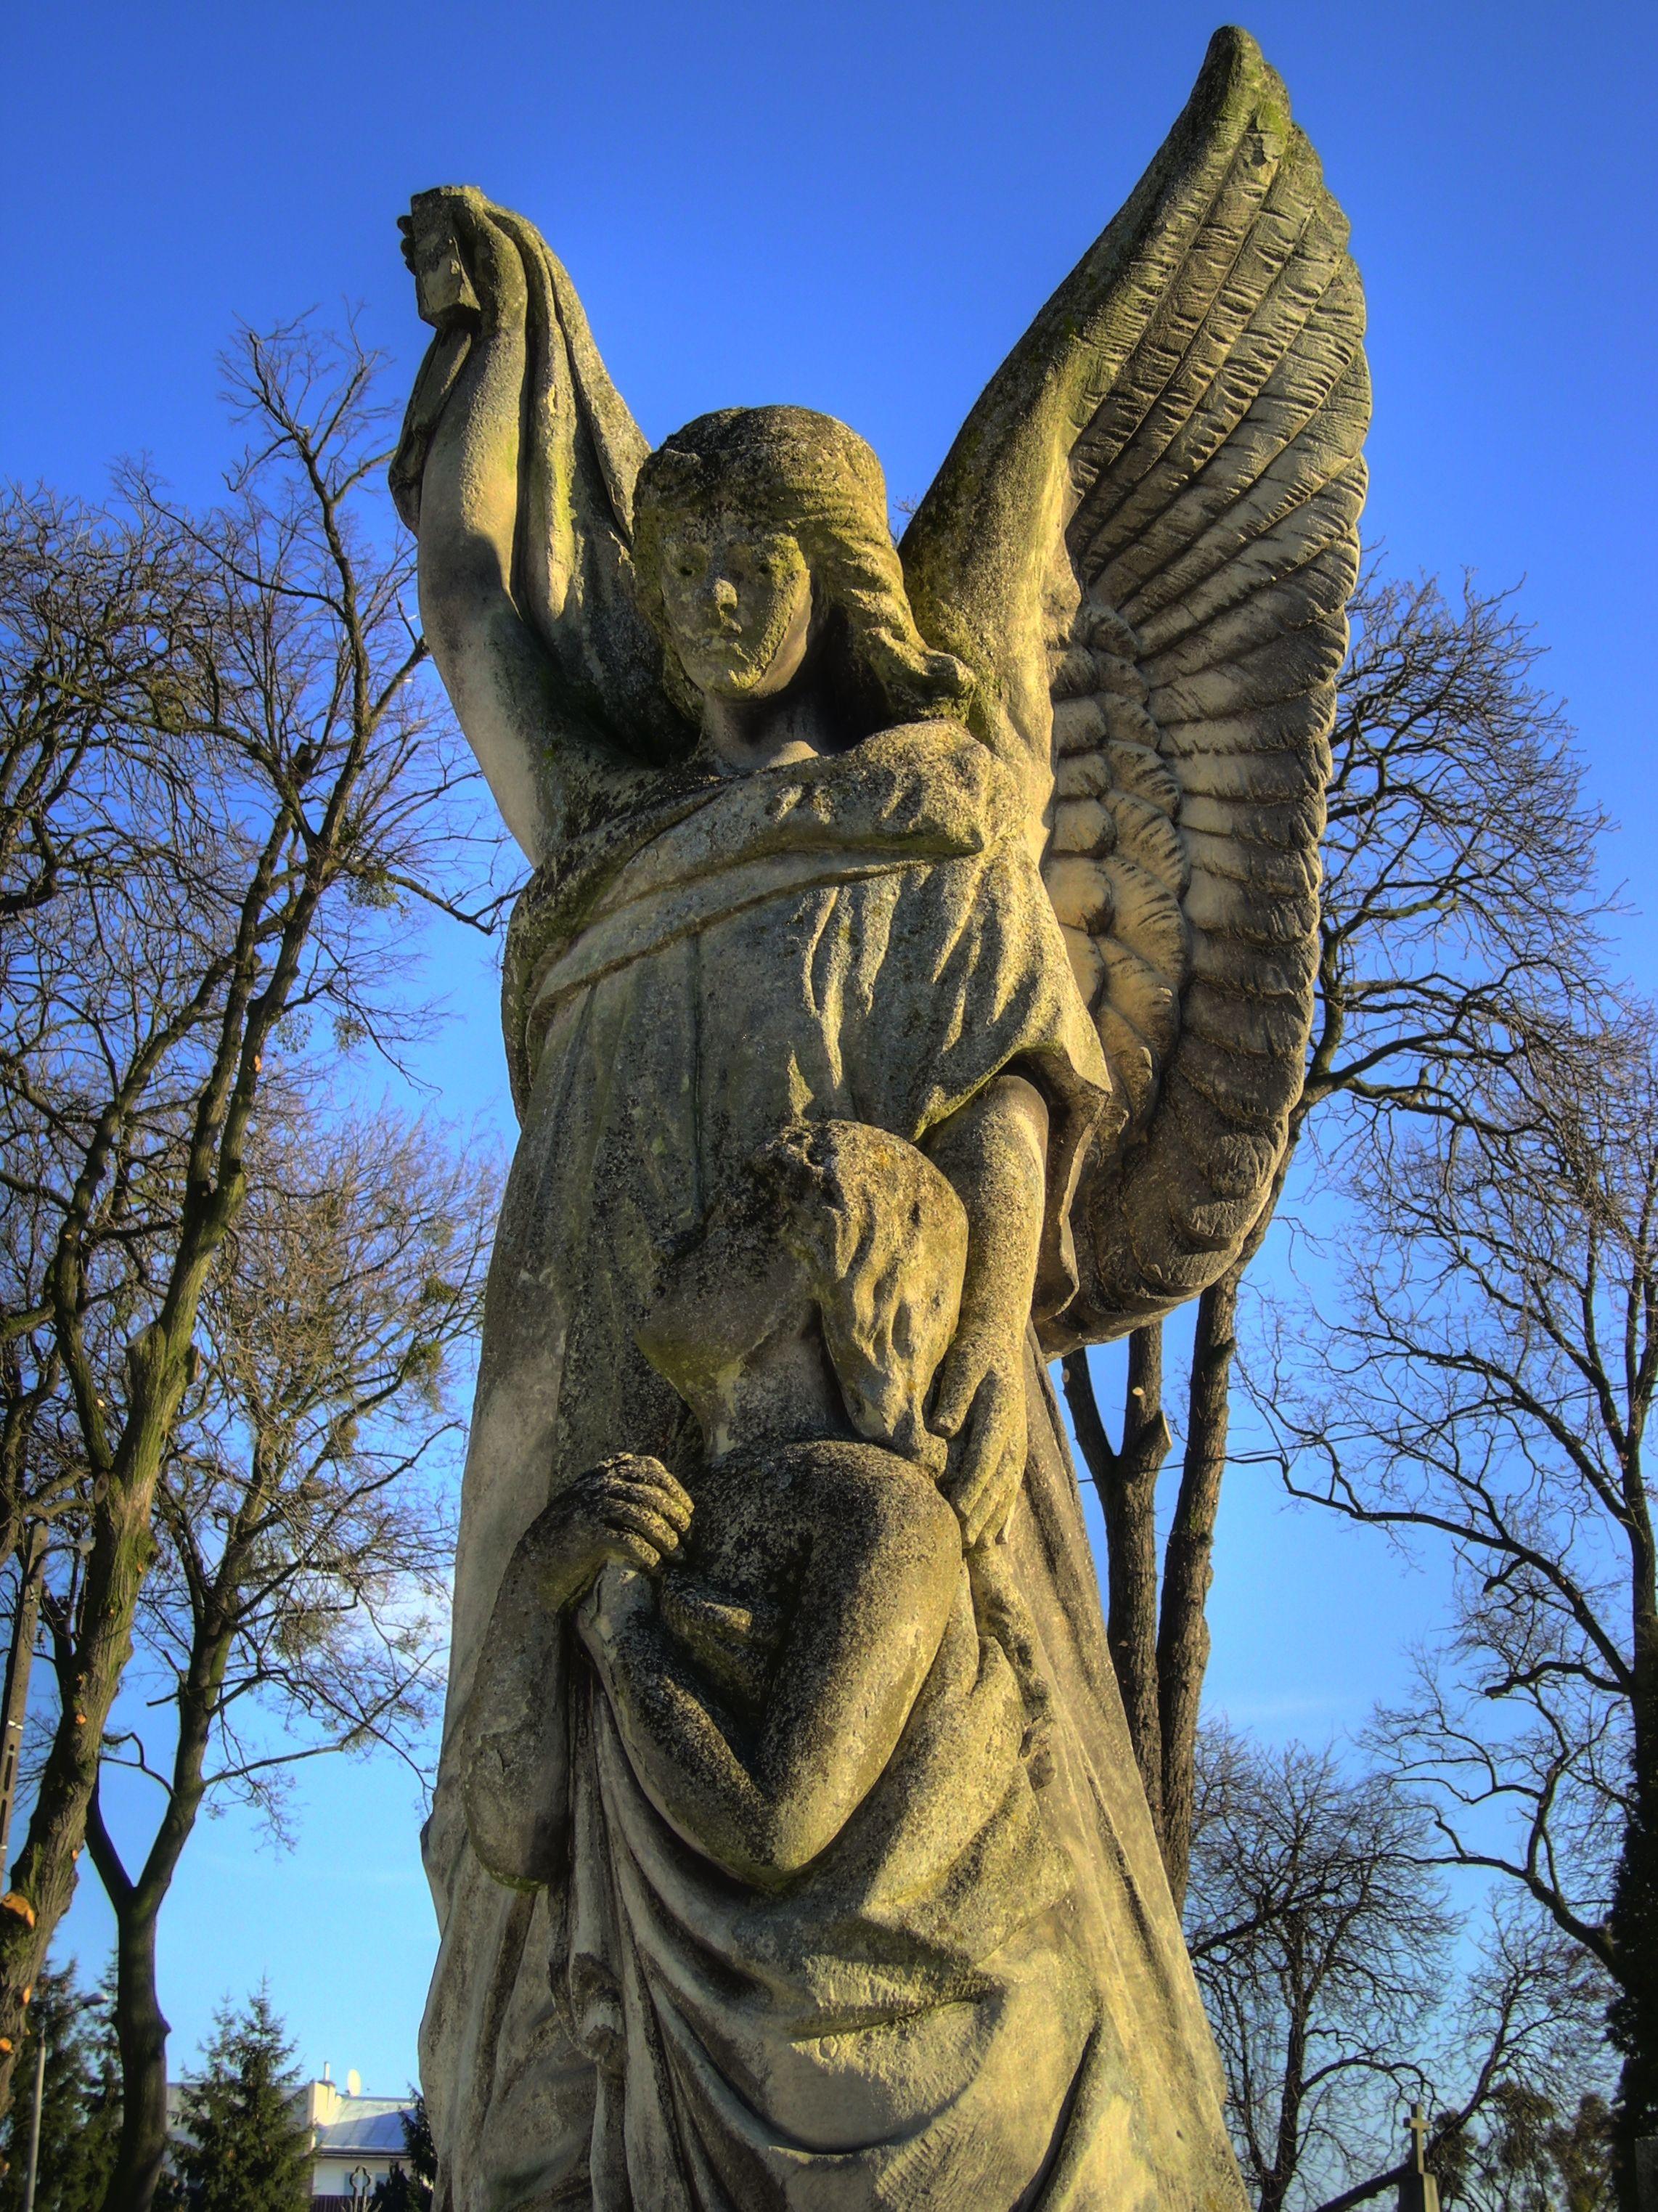 guardian angels statues - Google Search | Angels & Cherubs ...